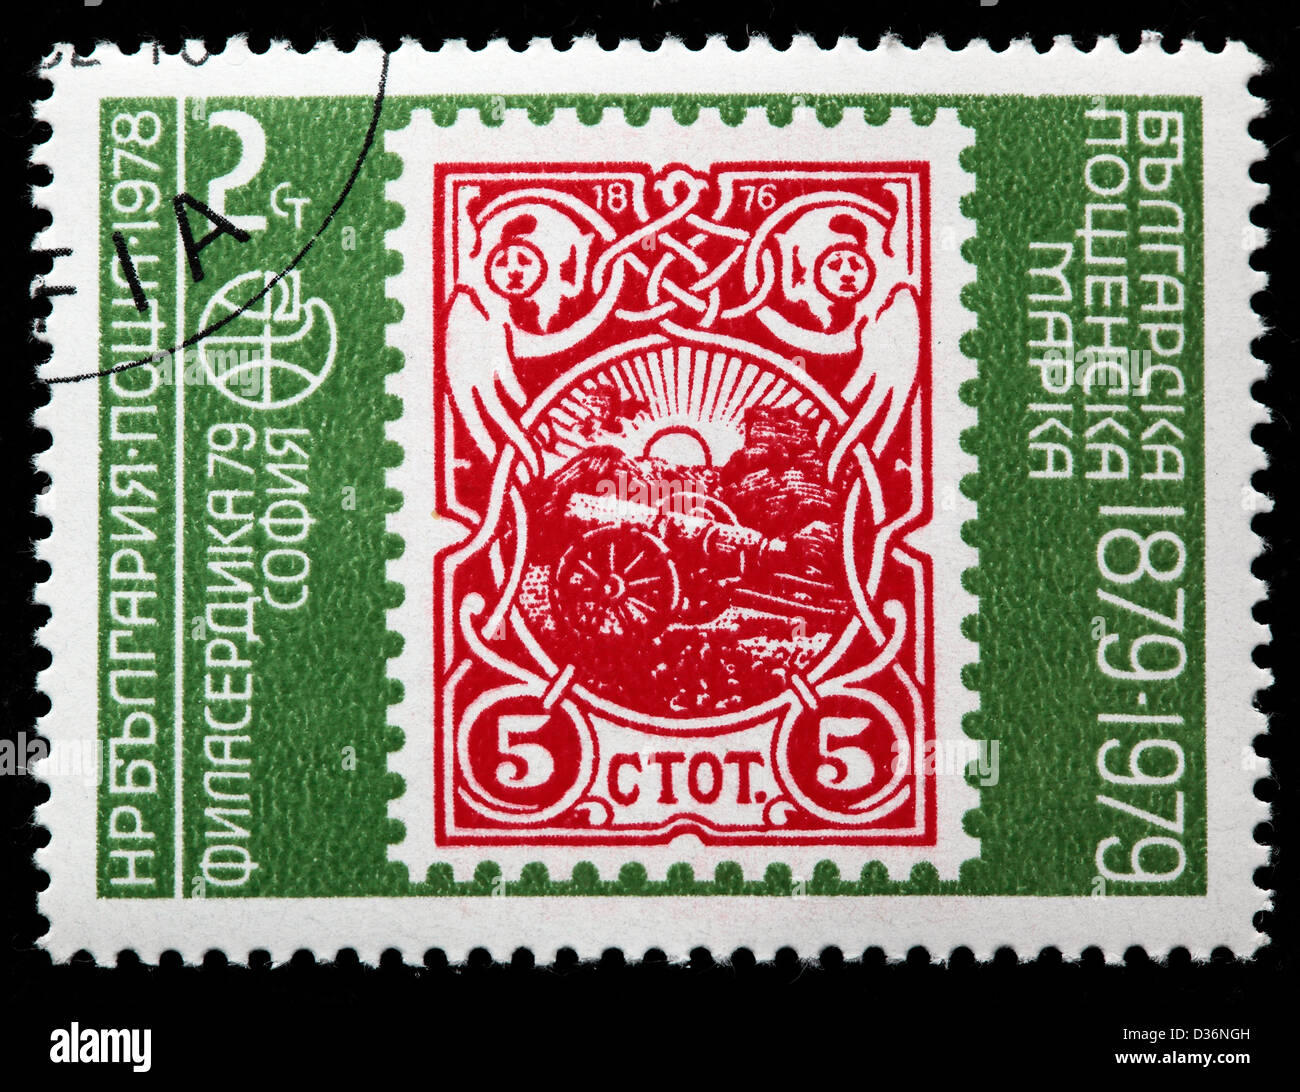 Bulgarian postage stamp, Bulgaria, 1979 - Stock Image